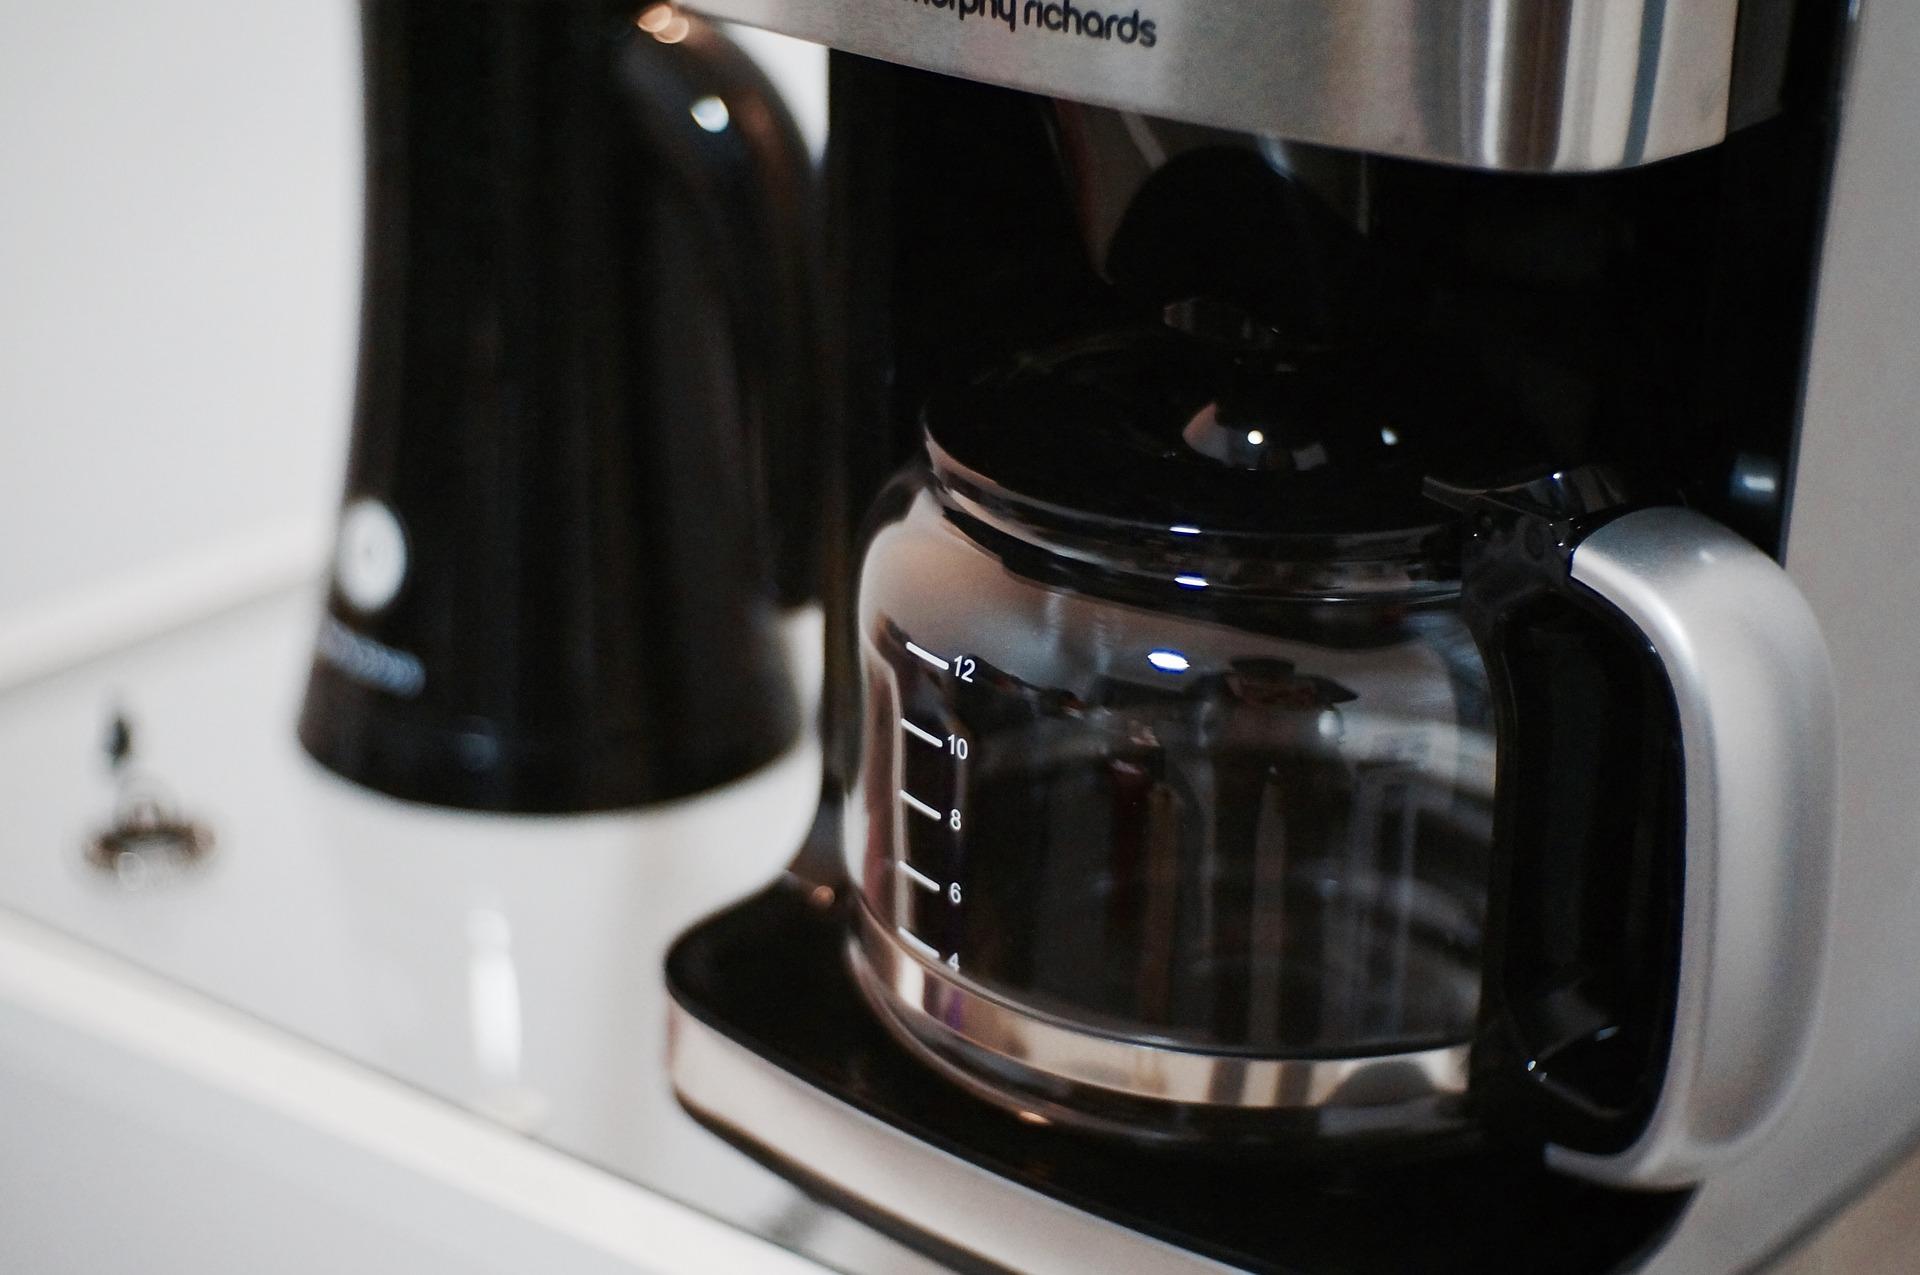 Kaffeemaschiene kocht Kaffee